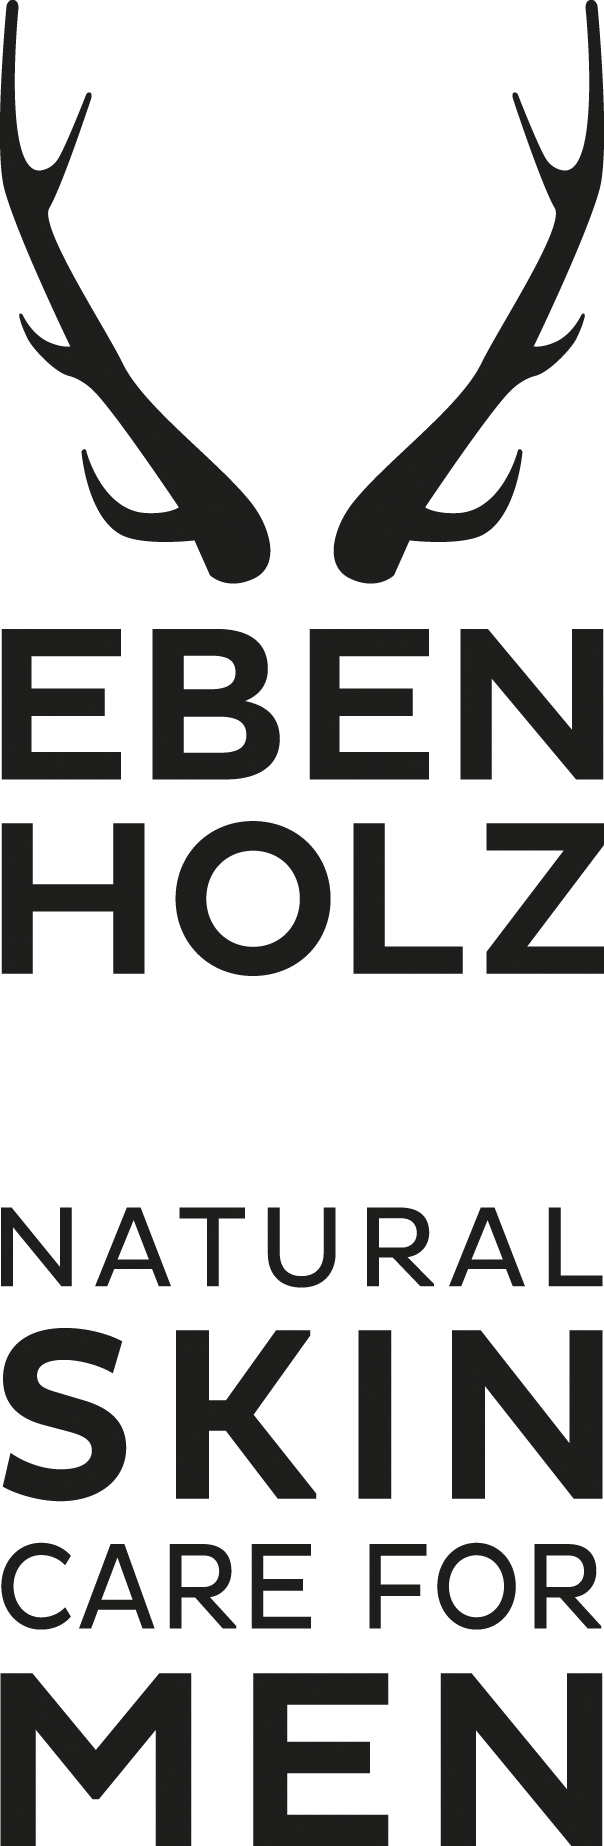 EBENHOLZ   natural skincare for men  